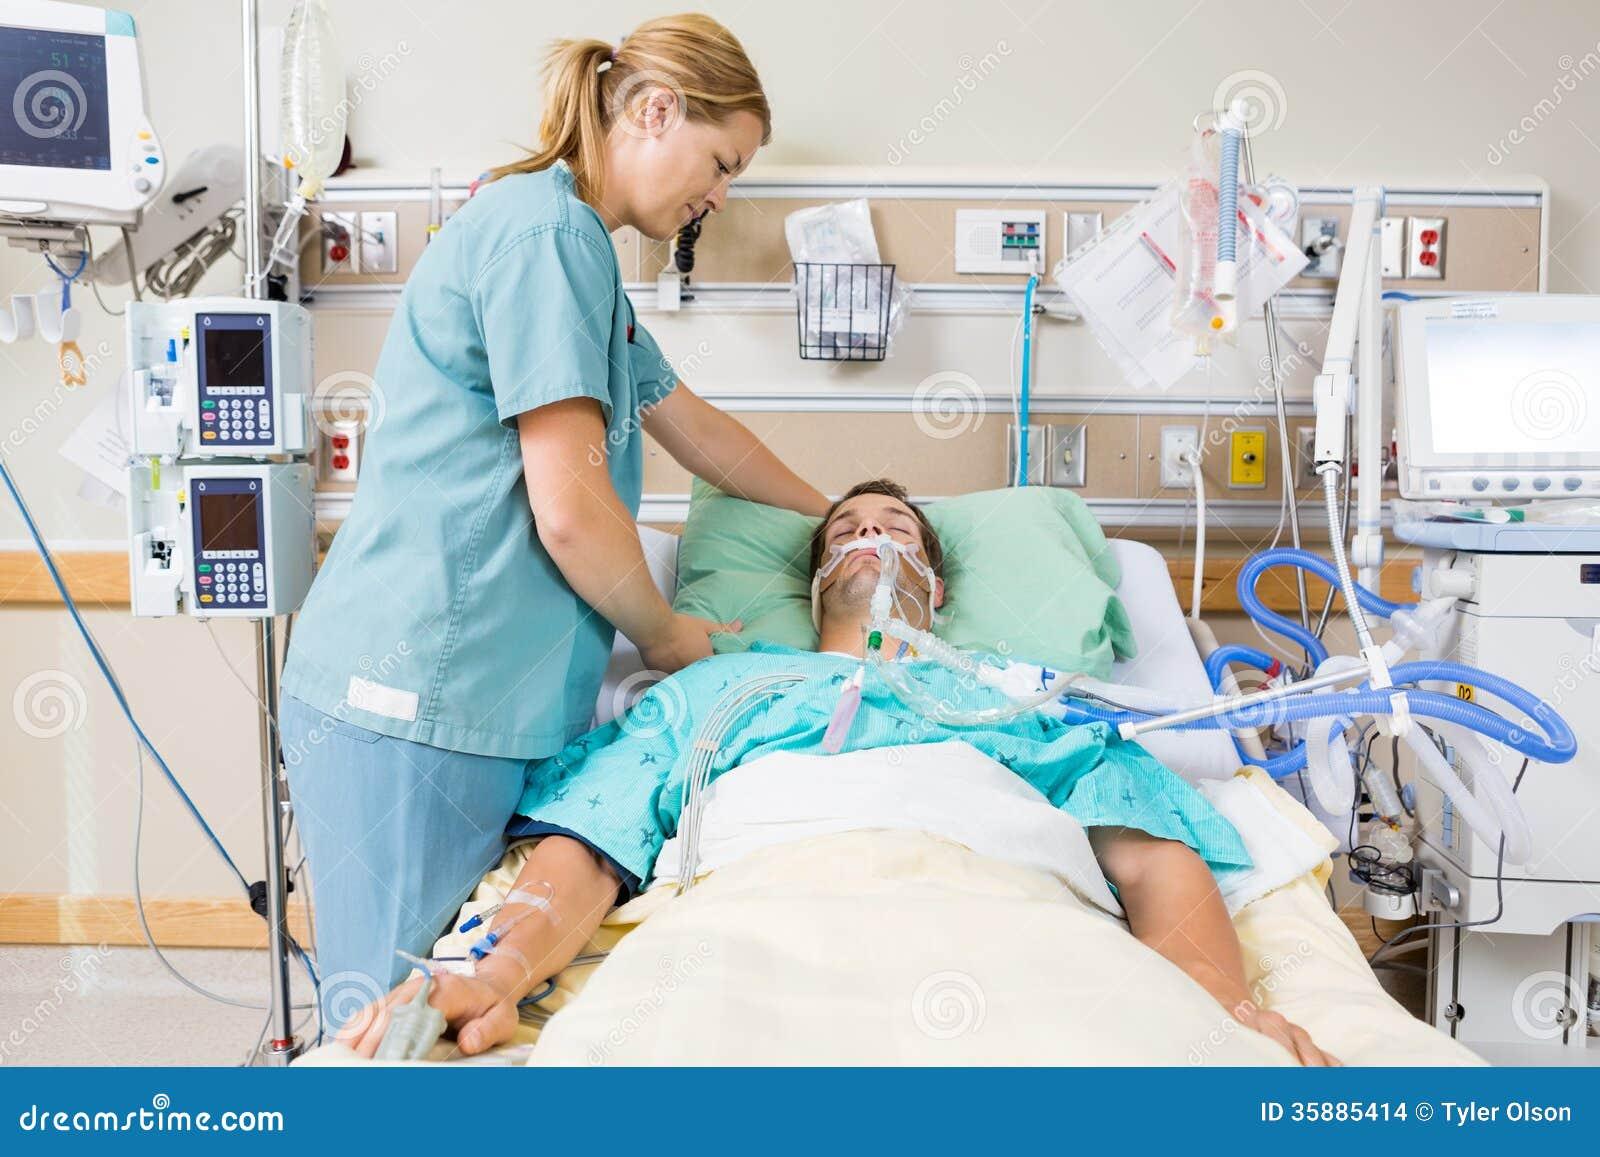 Фото с медсестрами 21 фотография